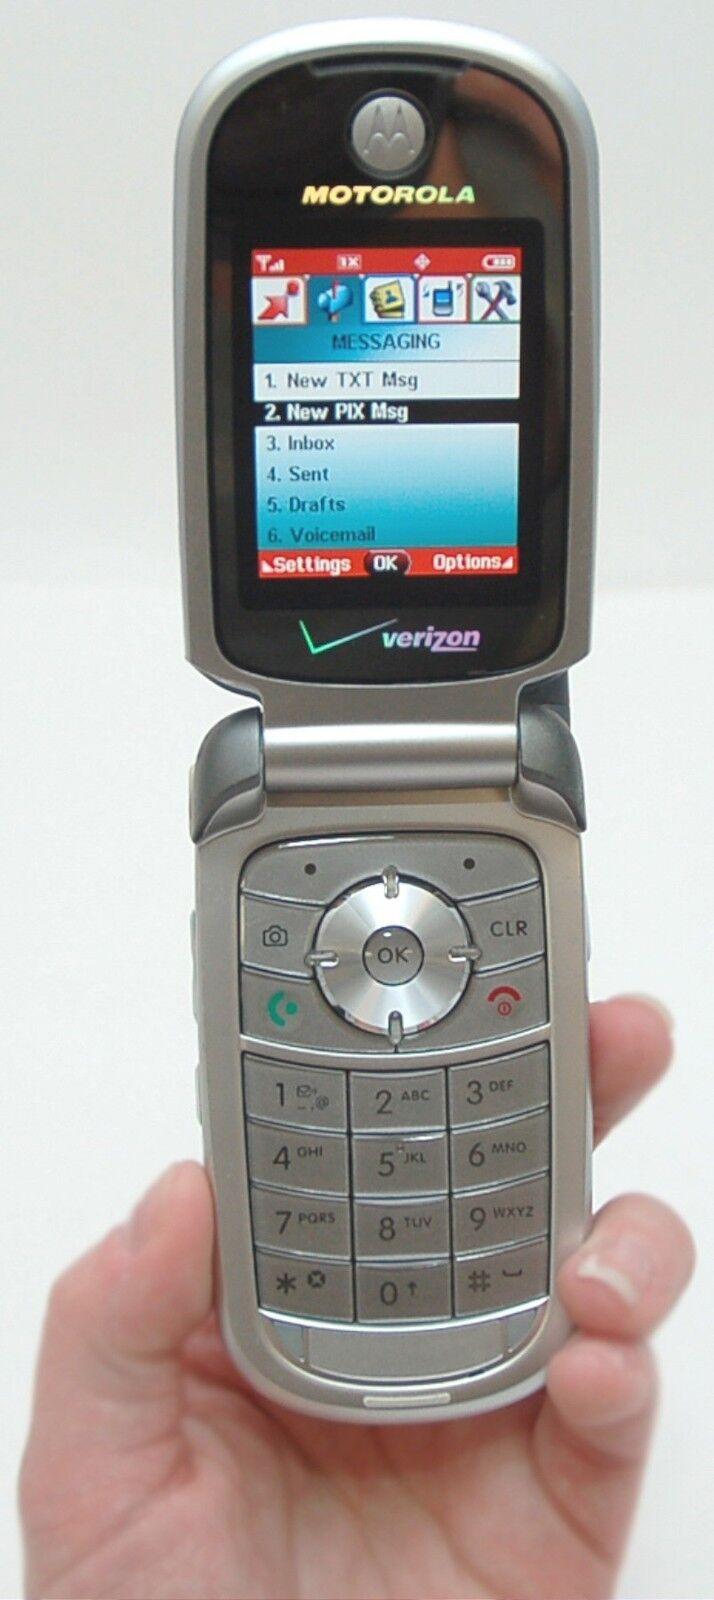 Manual Motorola V325i